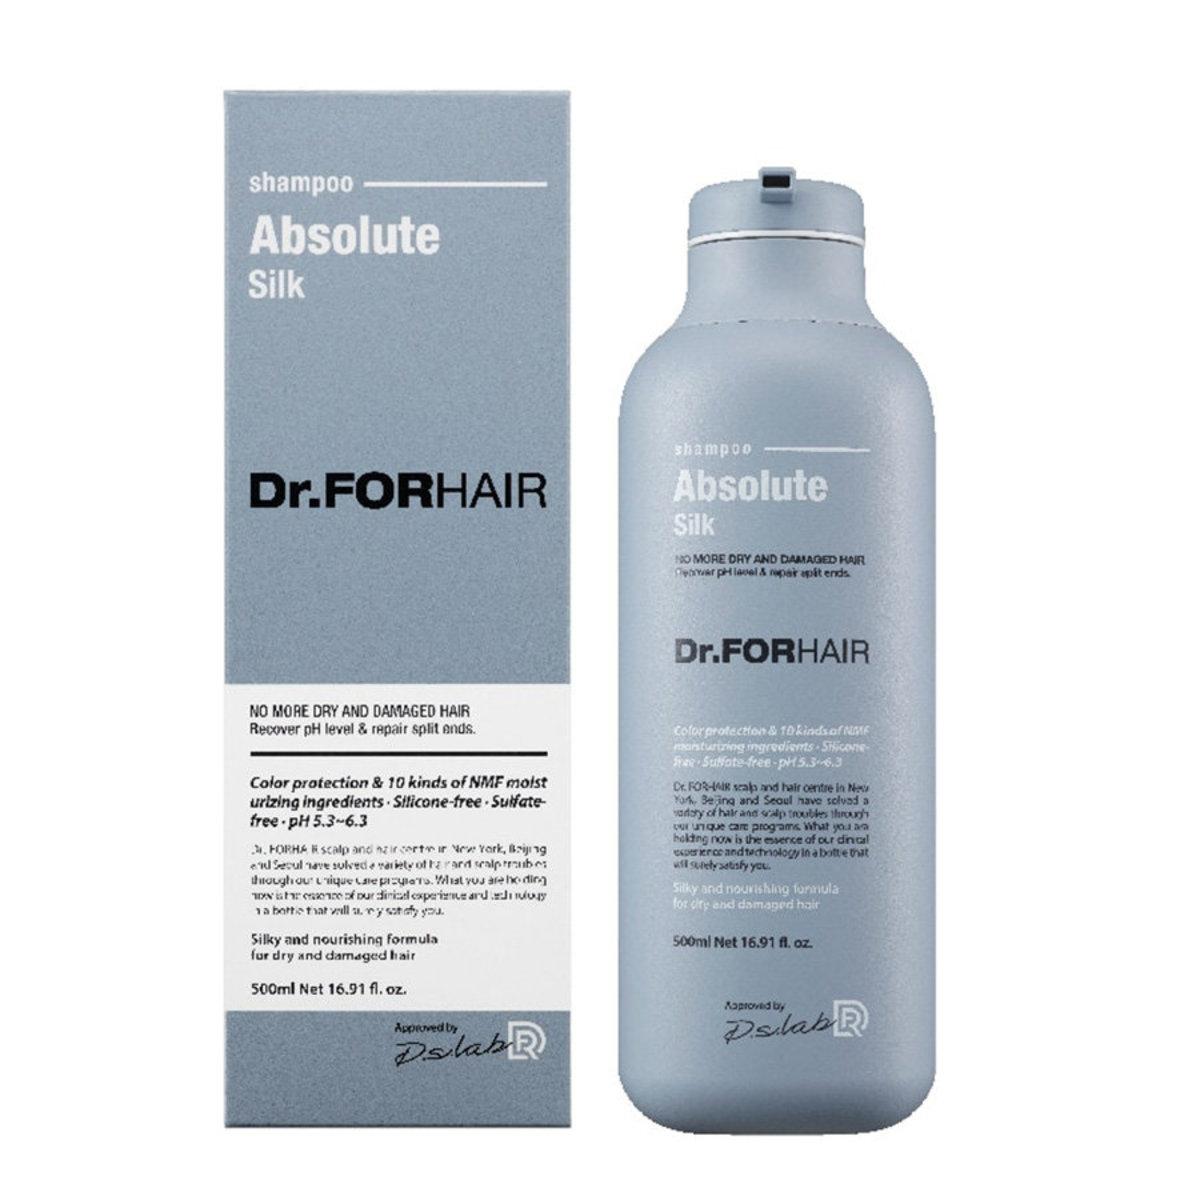 Dr.FORHAIR 深層修護受損髮質絲柔洗髮乳 500ml (平行進口)-1731